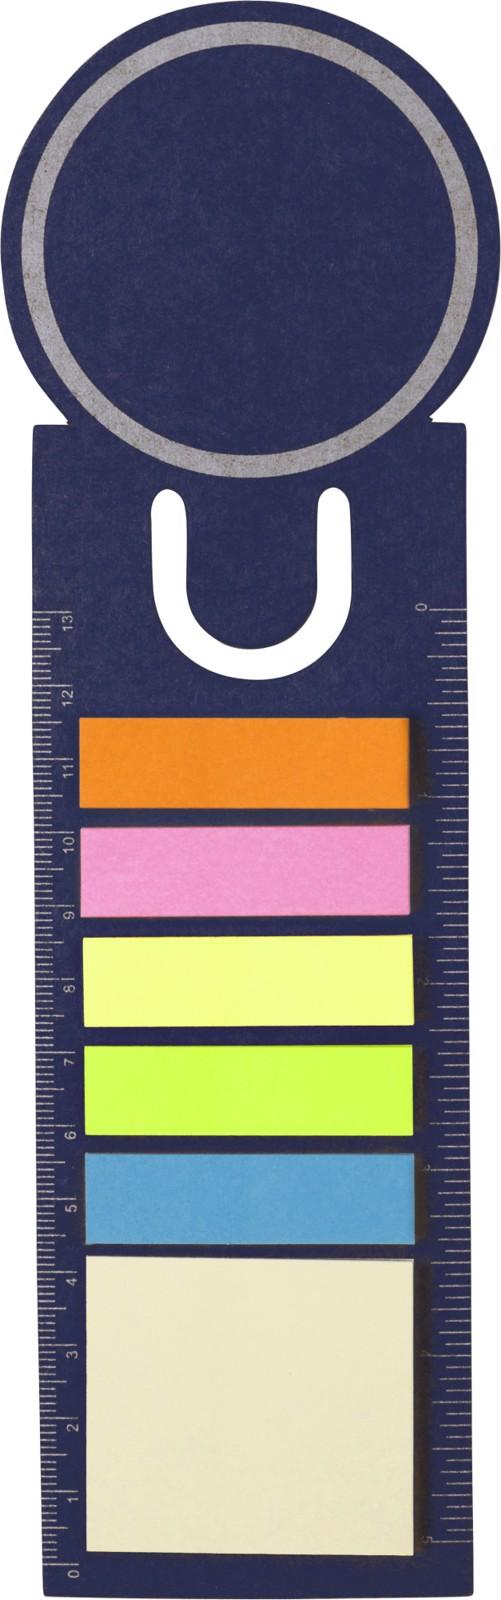 Cardboard bookmark - Blue